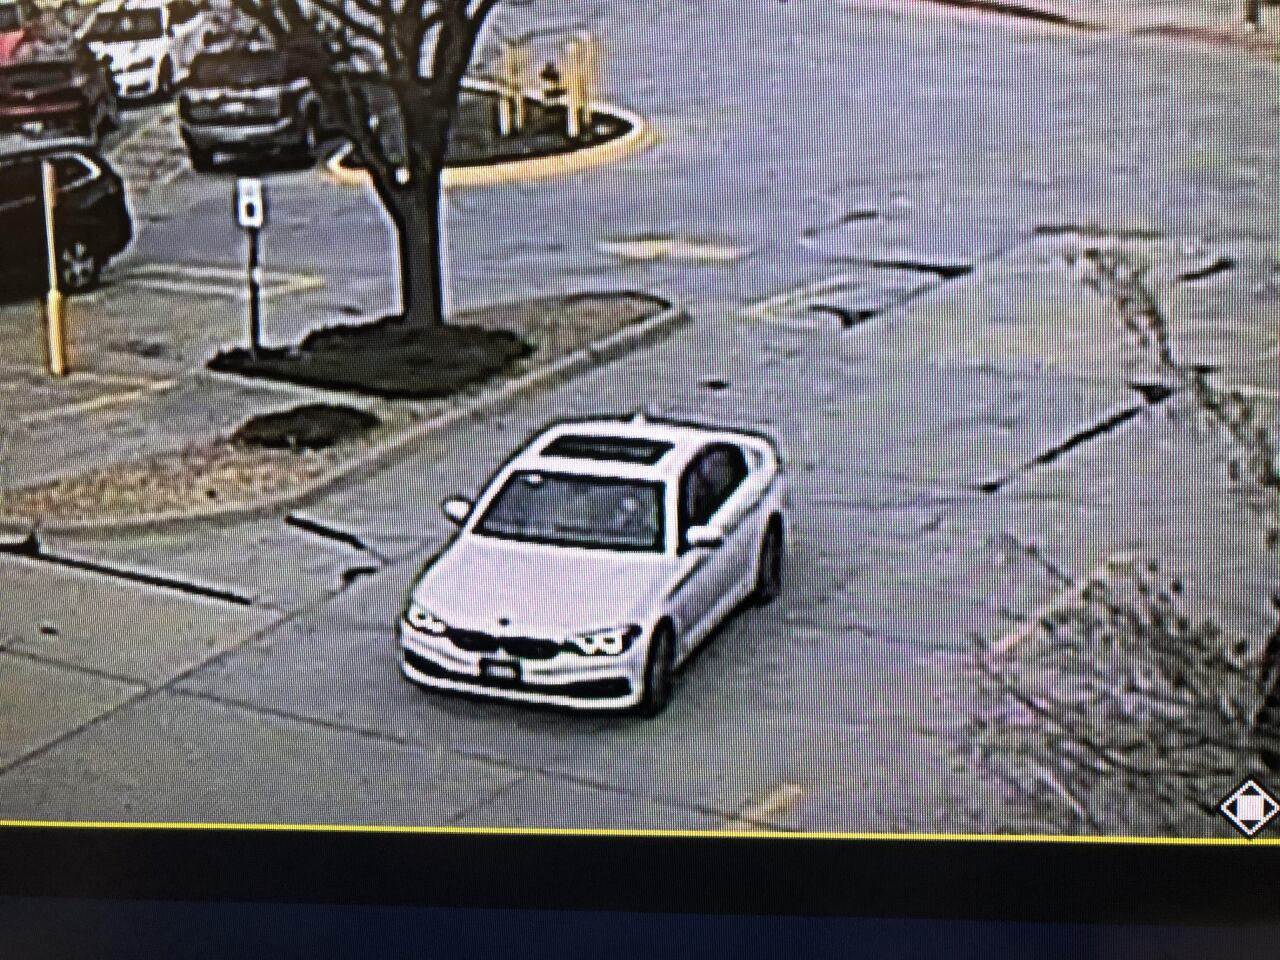 suspect_vehicle_westroads.jpg